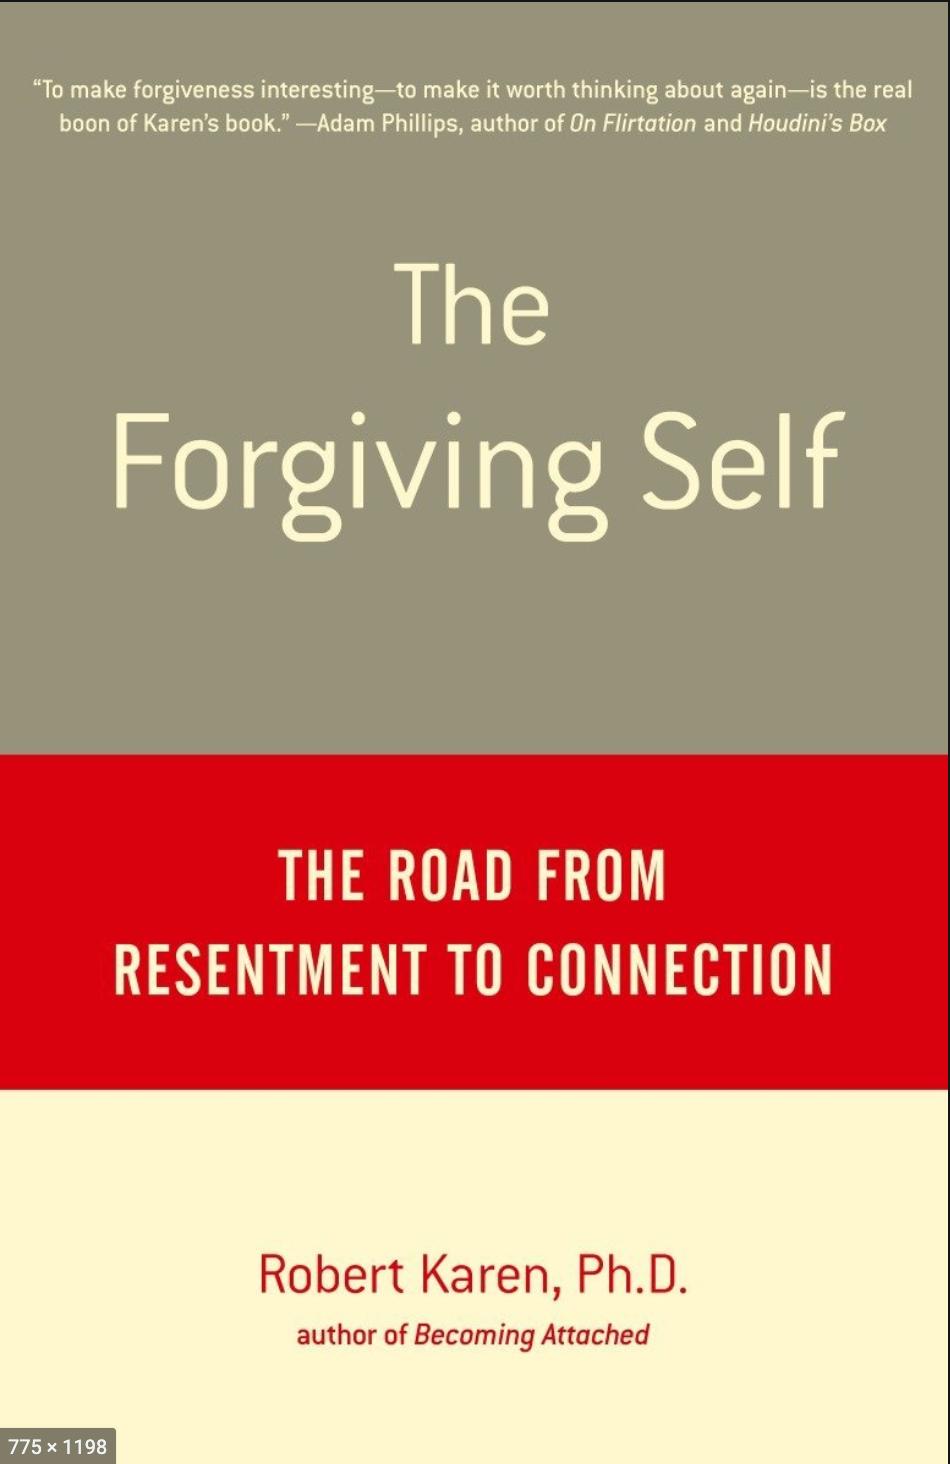 The Forgiving Self book